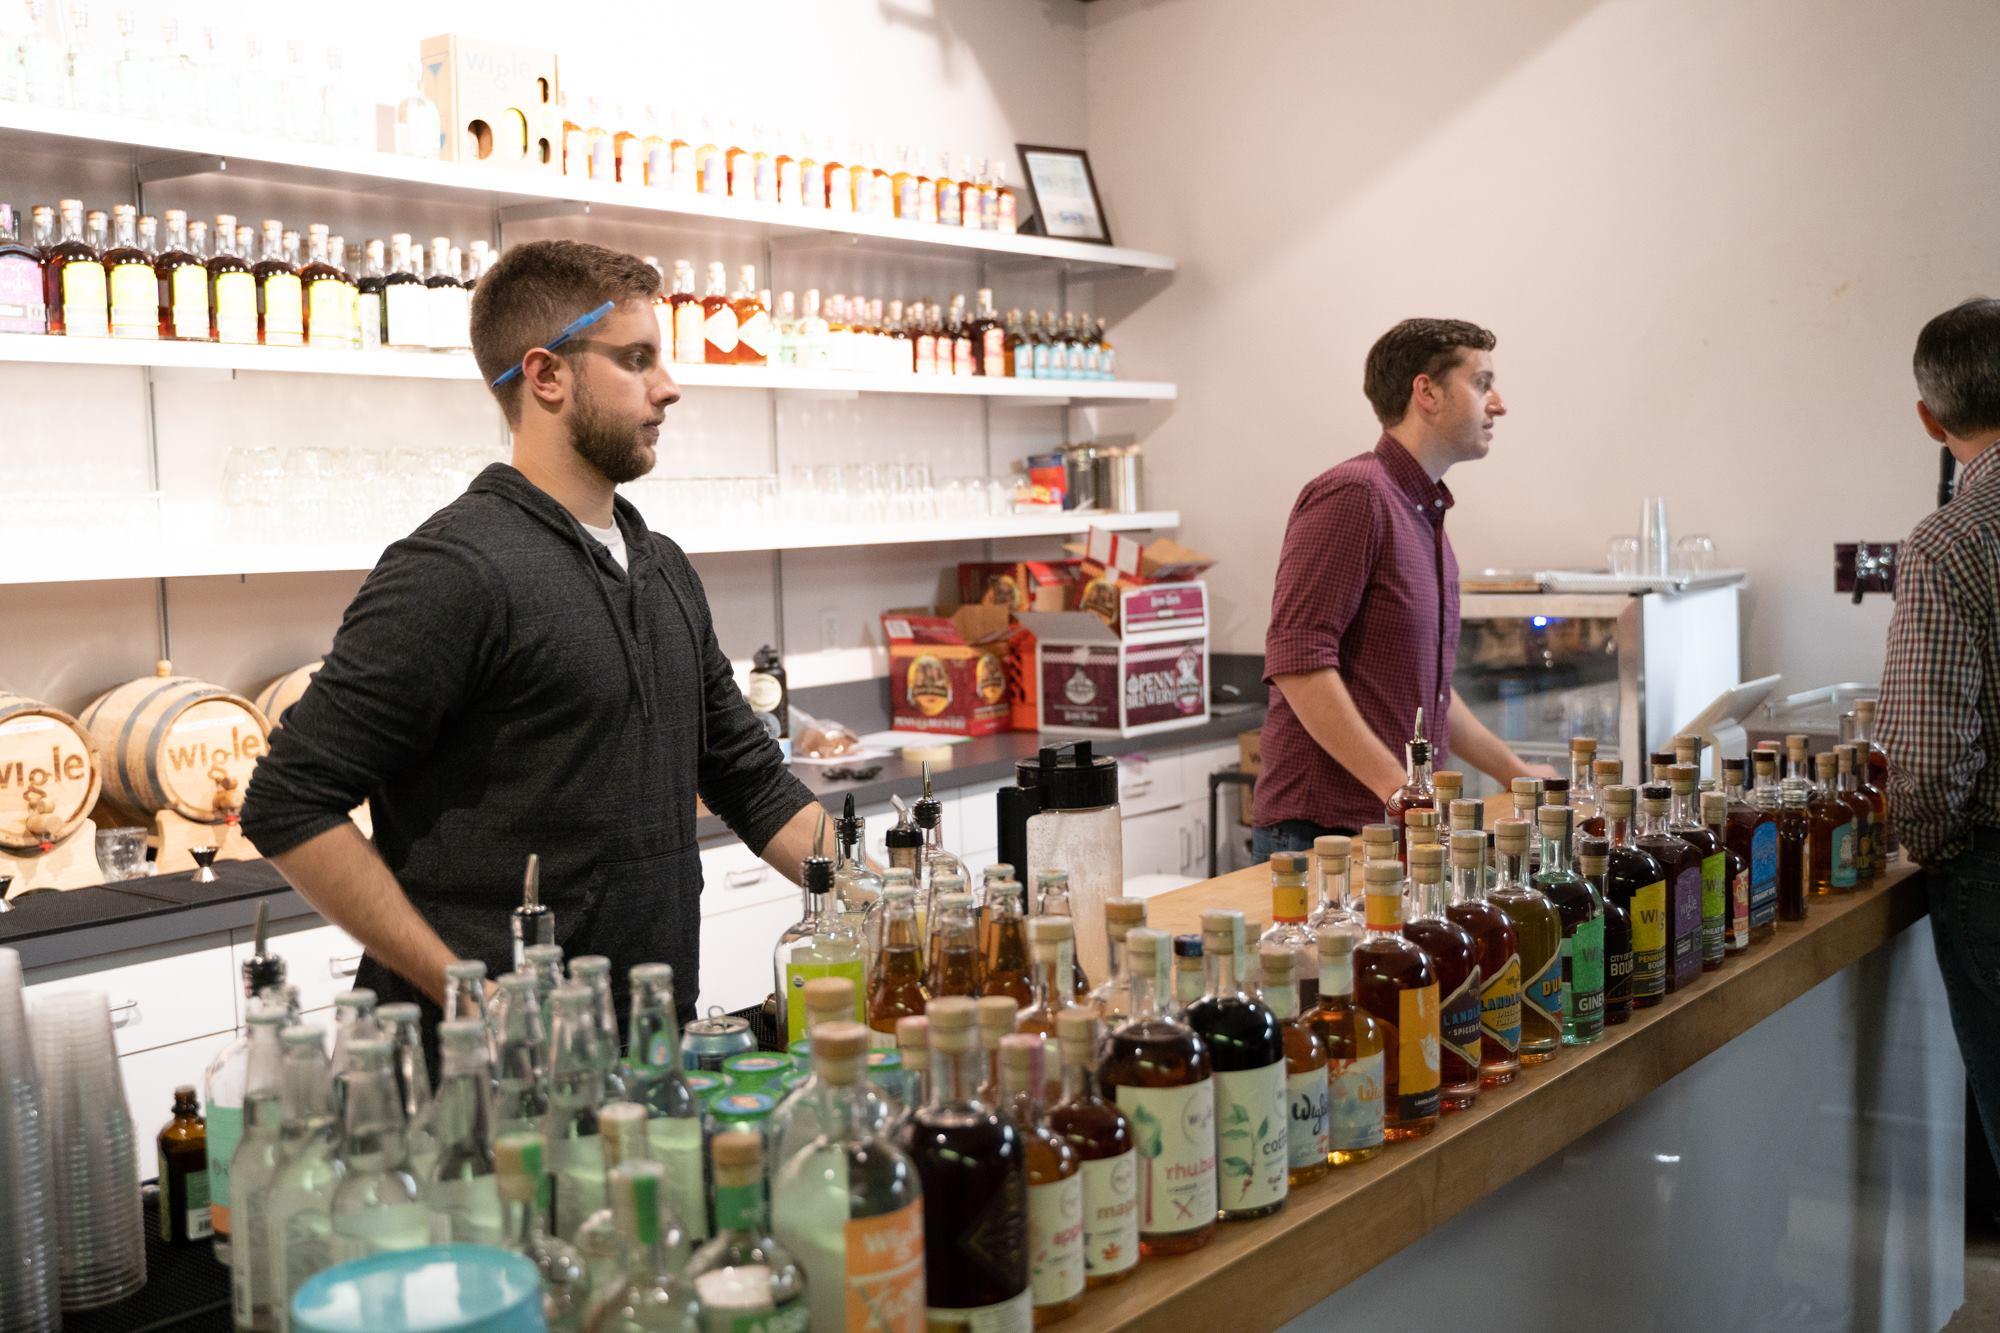 Tasting bar for Wigle Whiskey